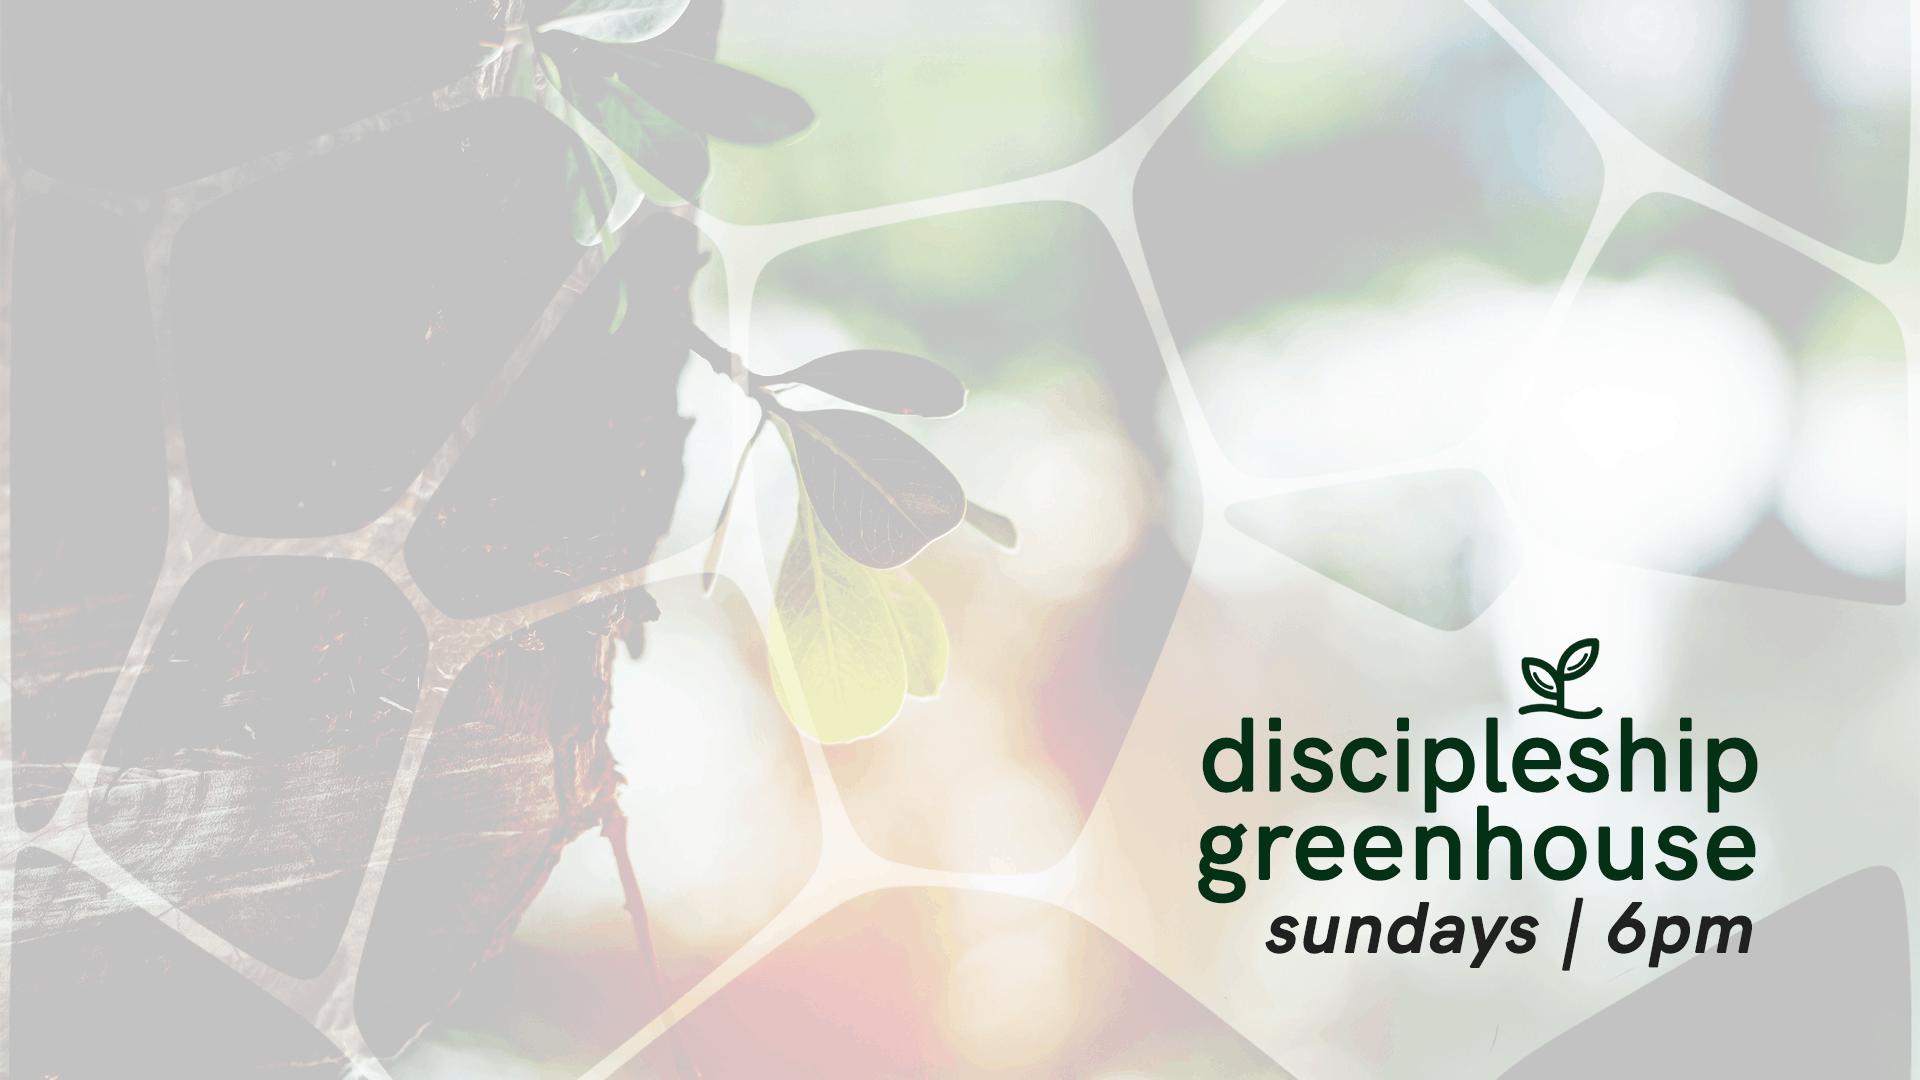 Discipleship Greenhouse